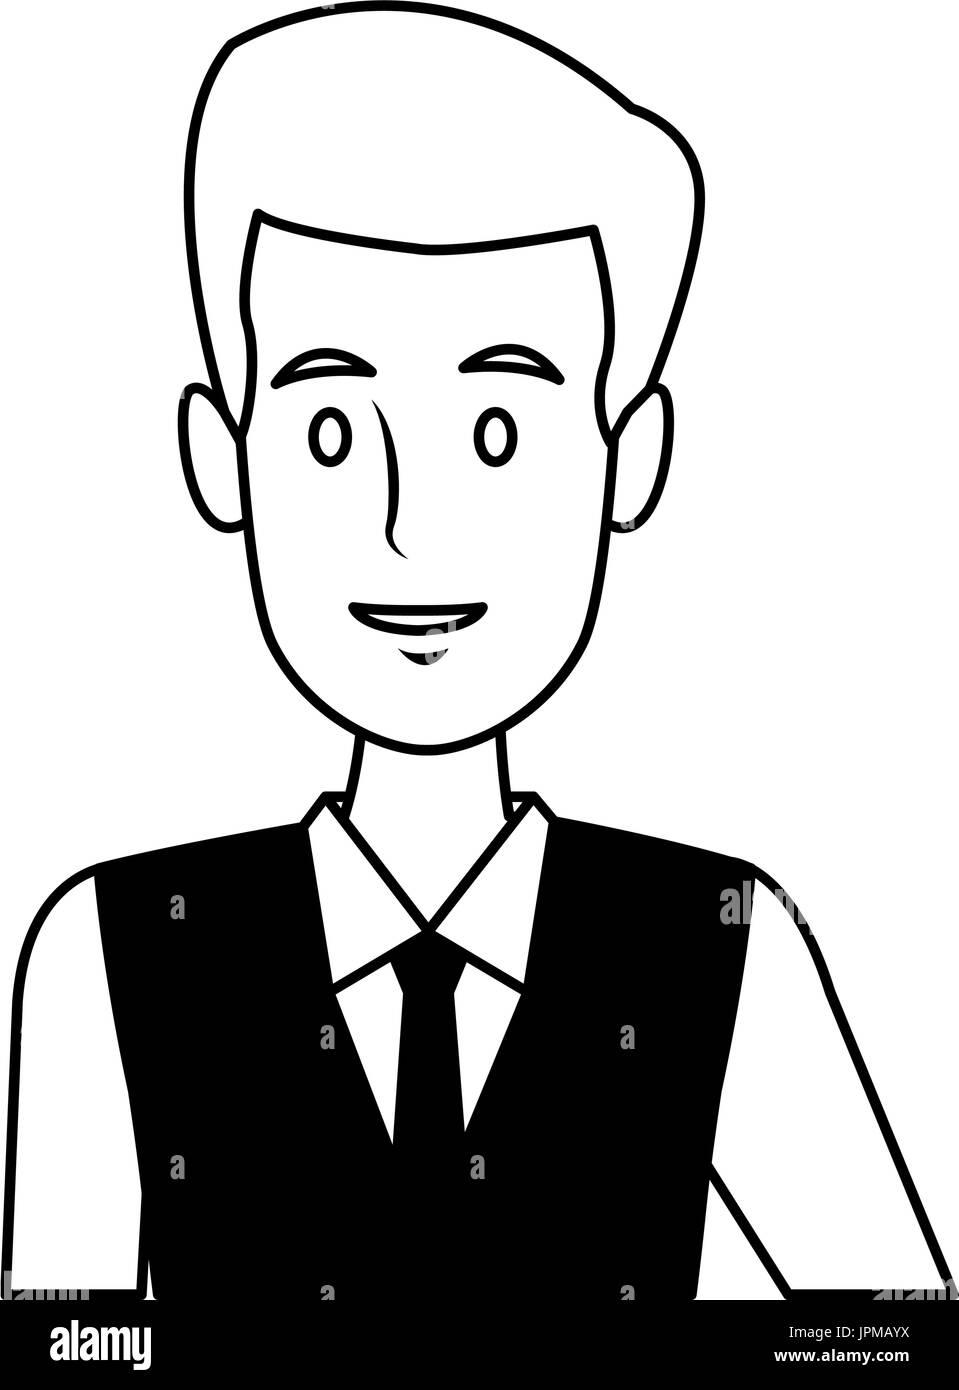 business man suit portrait manager employee or entrepreneur person - Stock Image